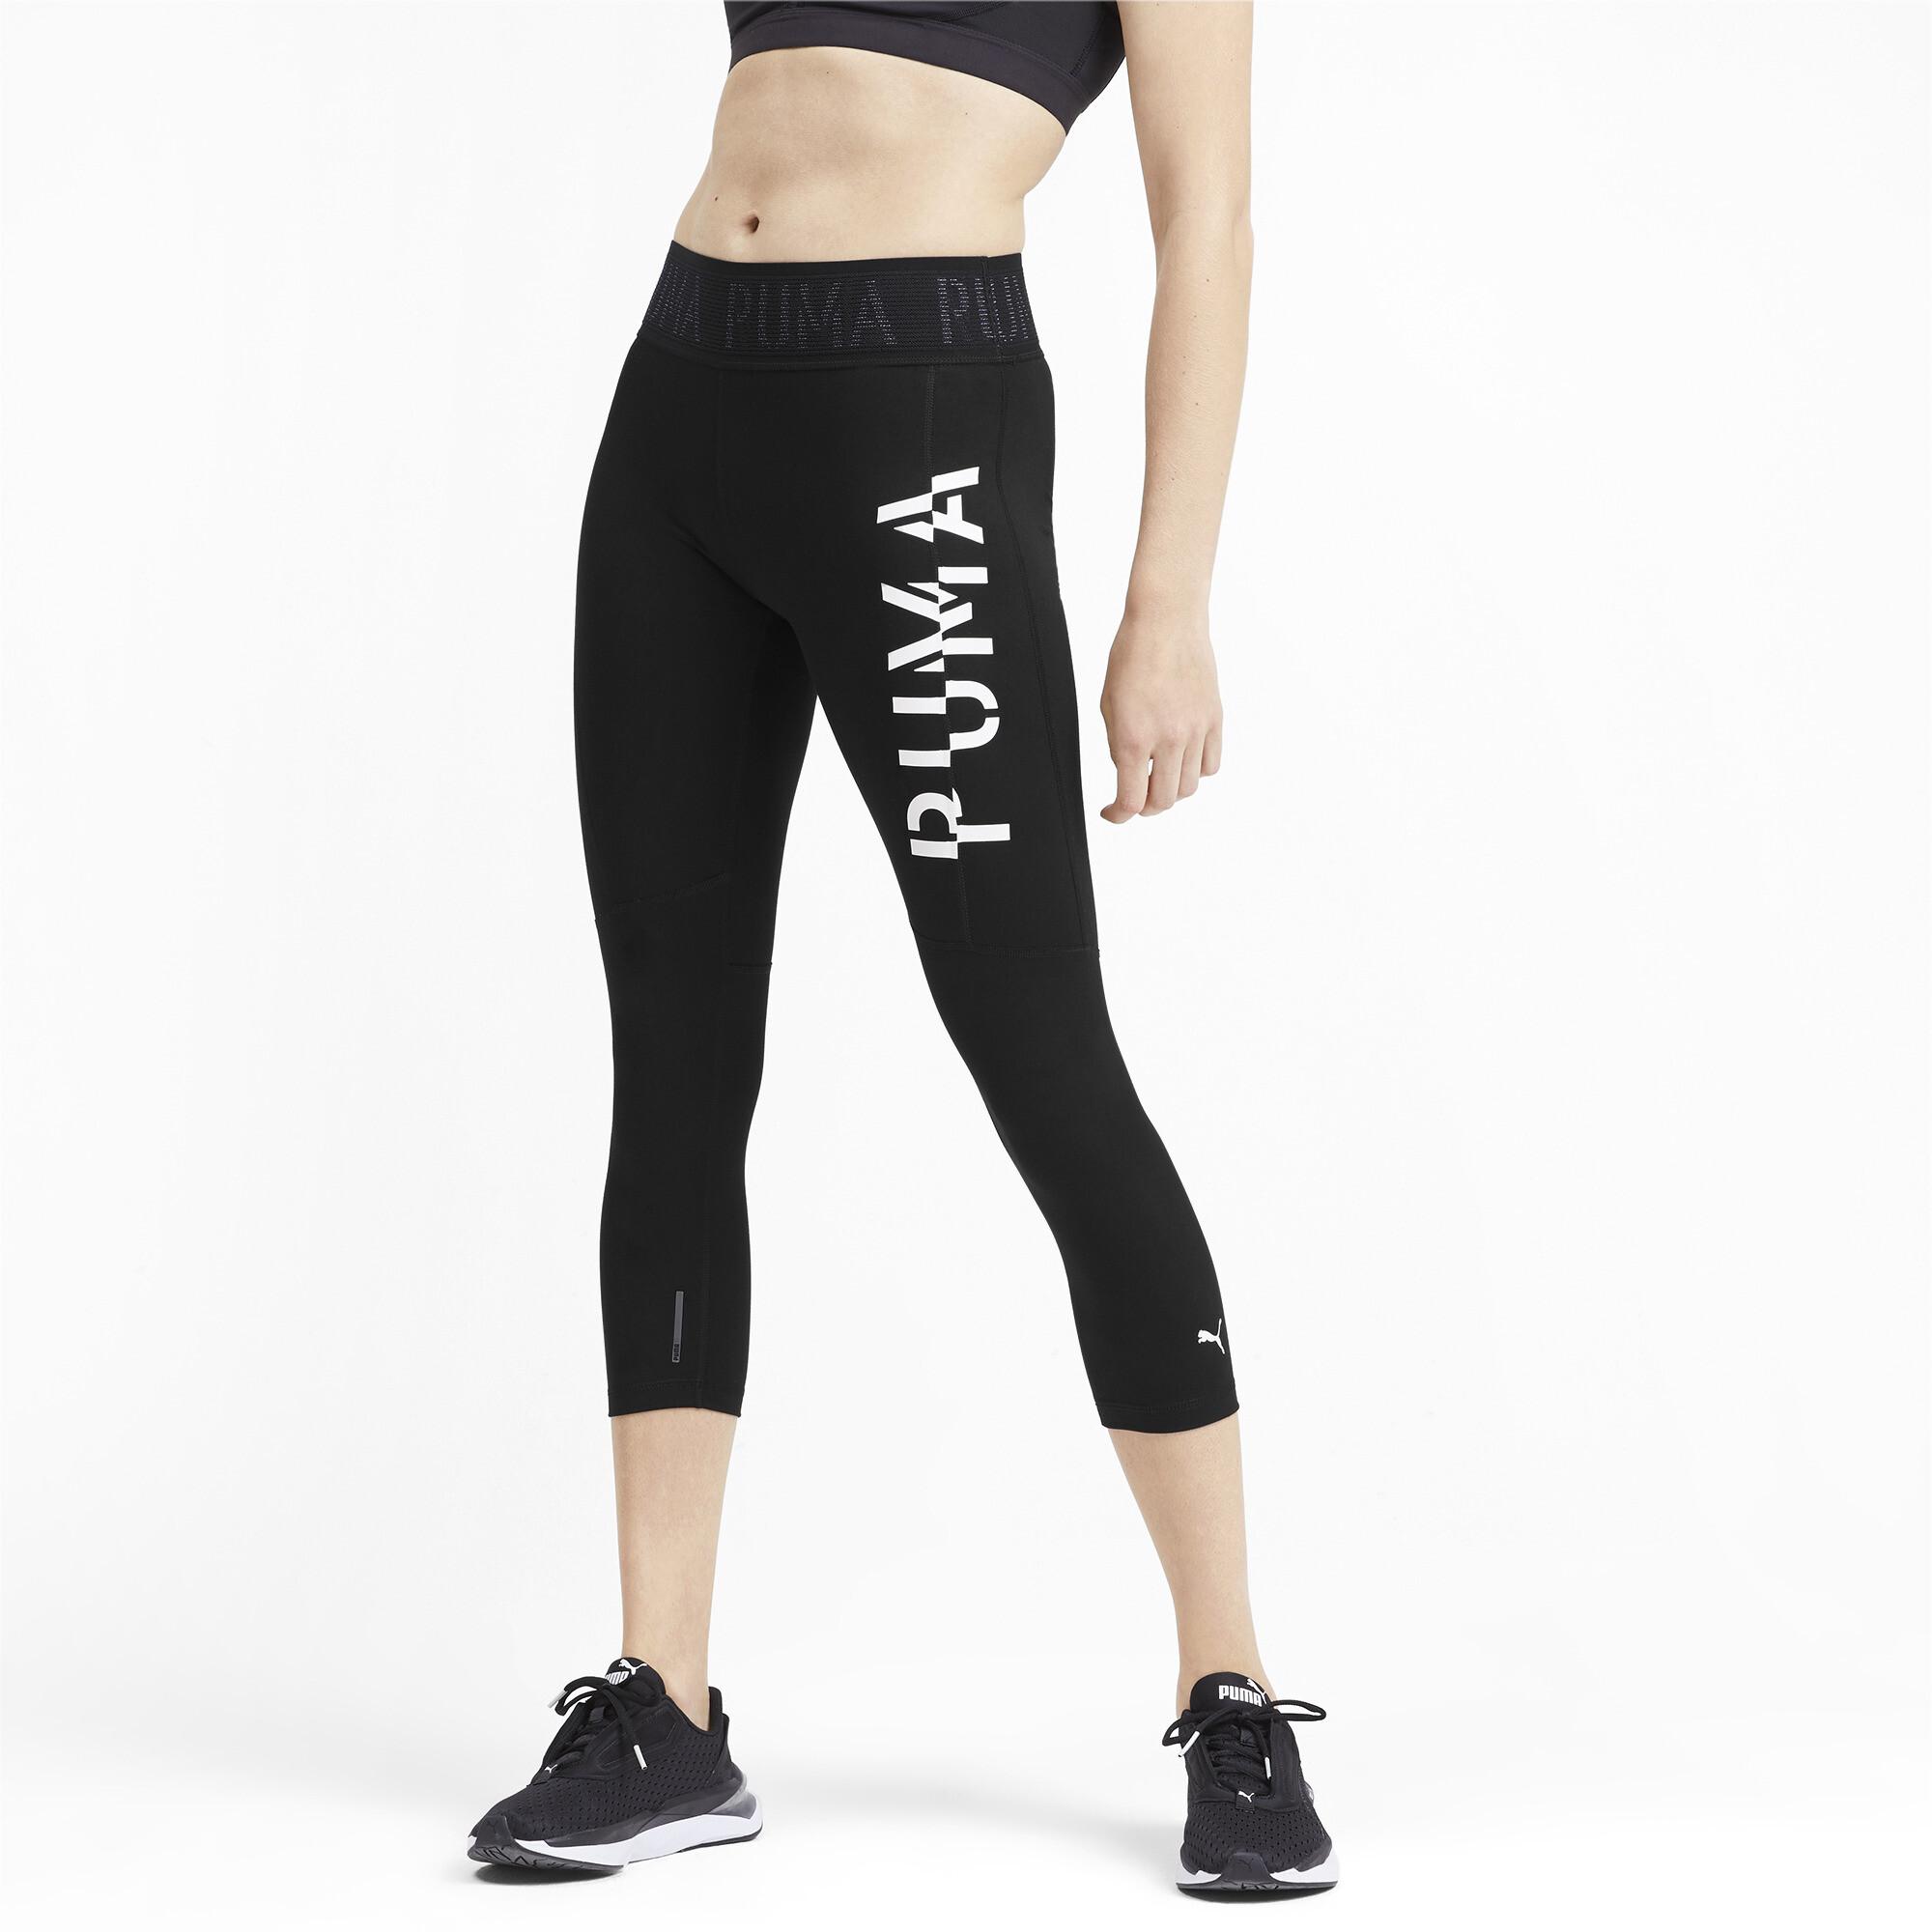 PUMA-Logo-Women-039-s-3-4-Leggings-Girls-Training thumbnail 9